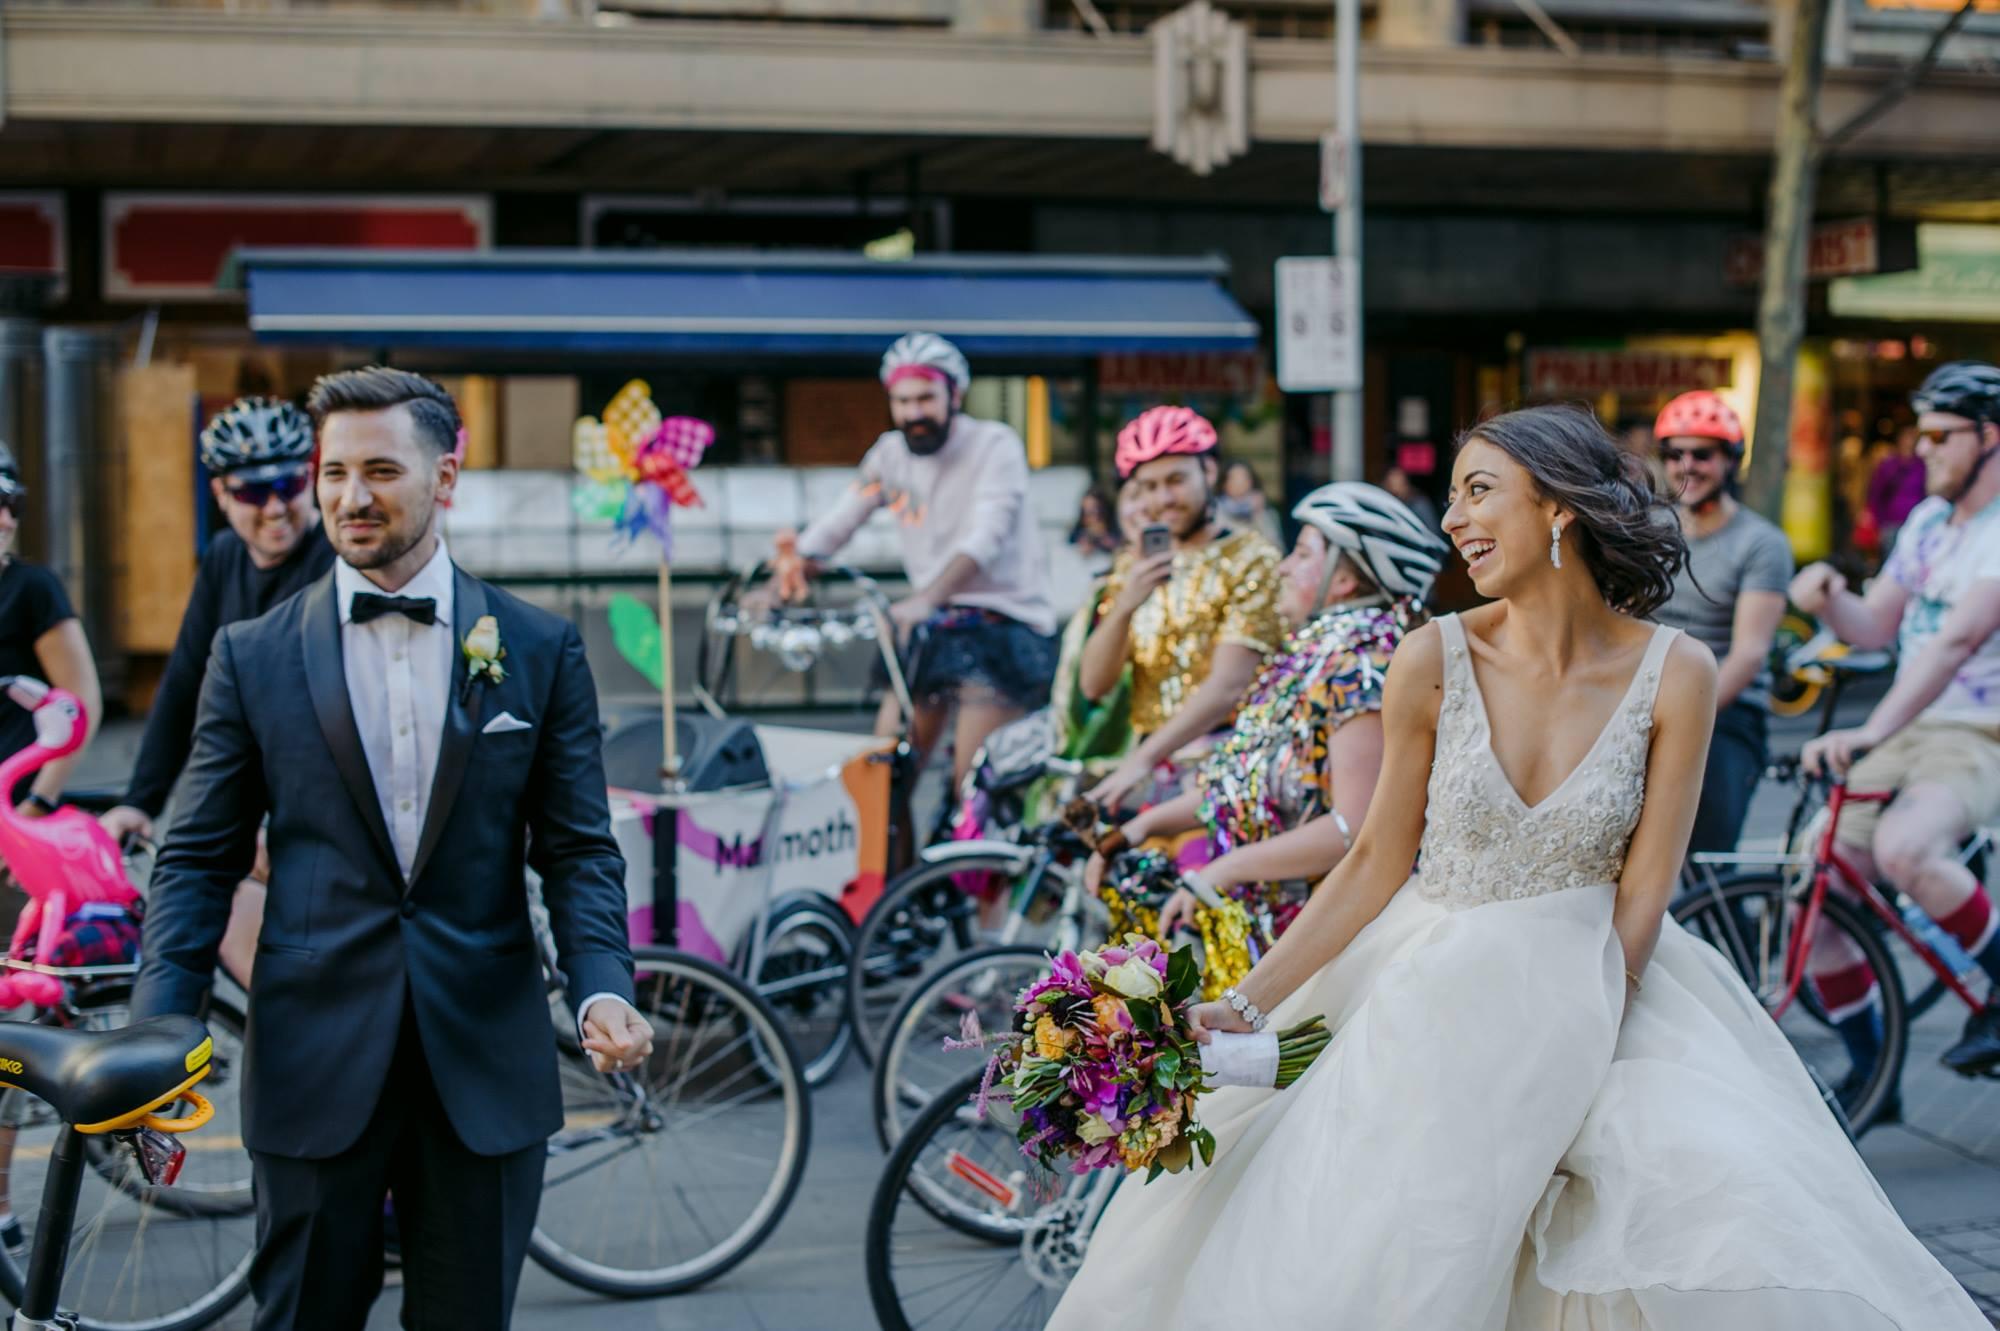 melbourne wedding dress.jpg